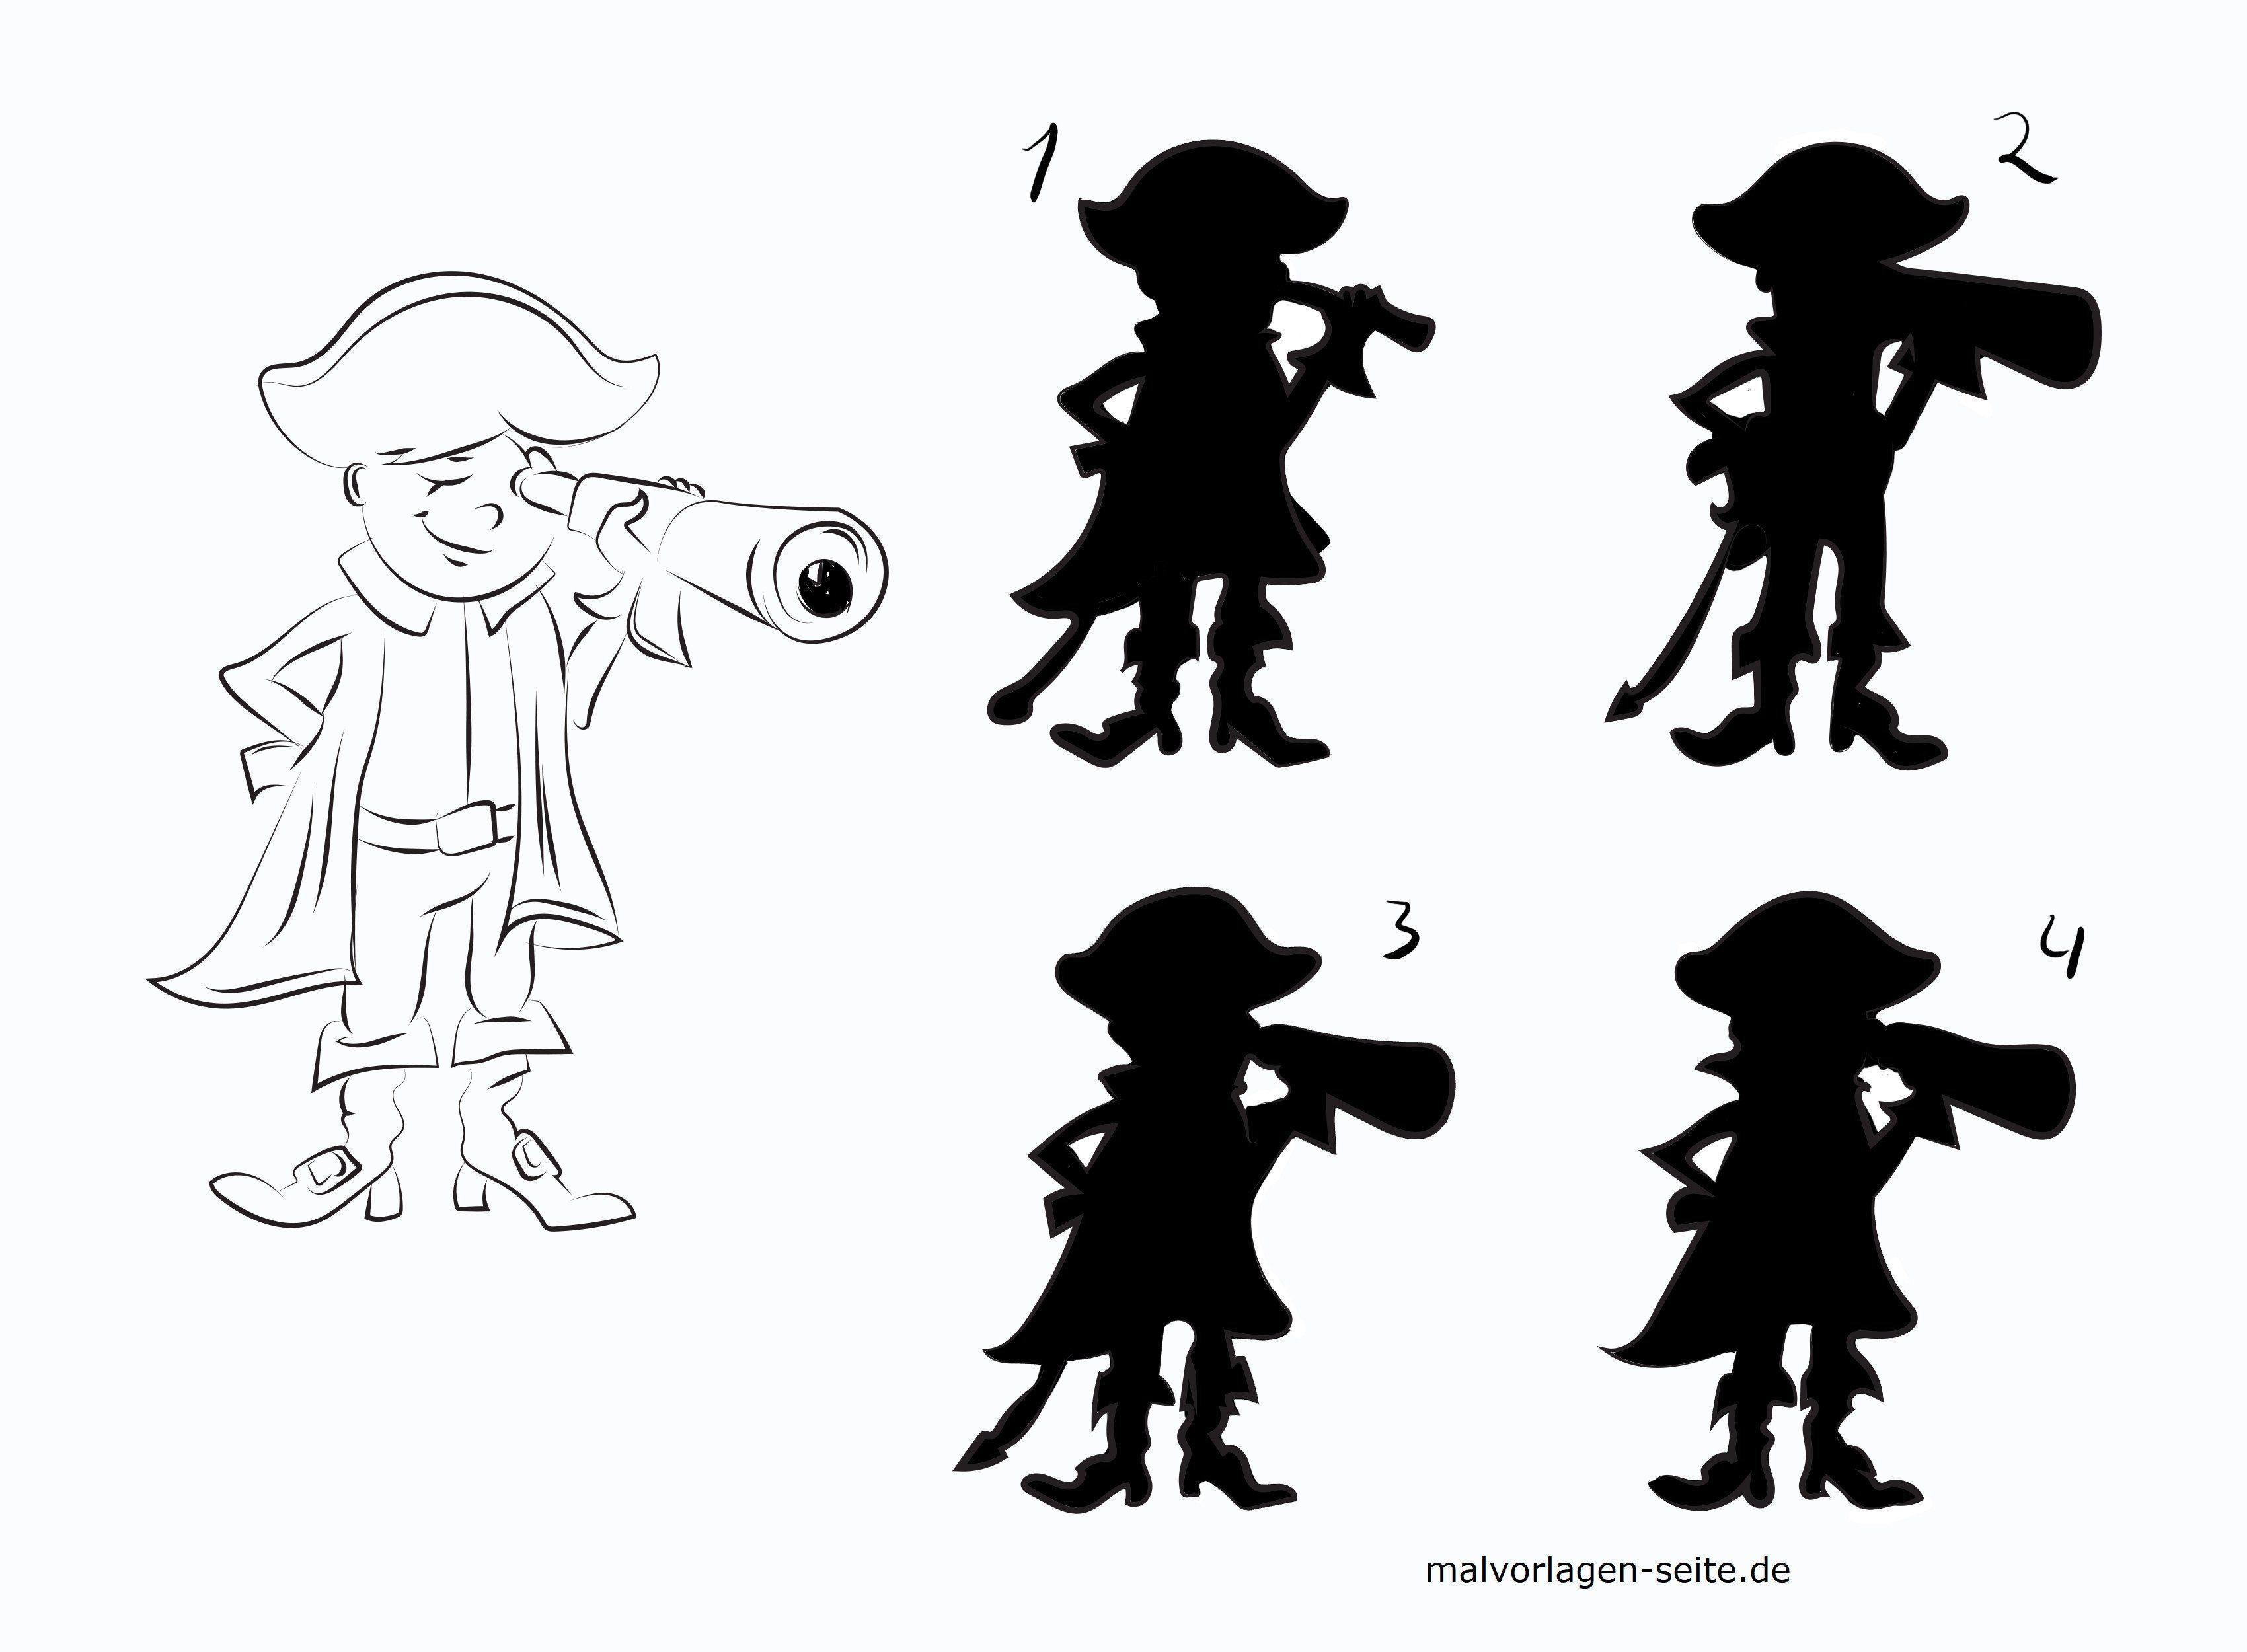 Schattenrätsel Pirat Rätsel Gratis Malvorlagen Zum Download